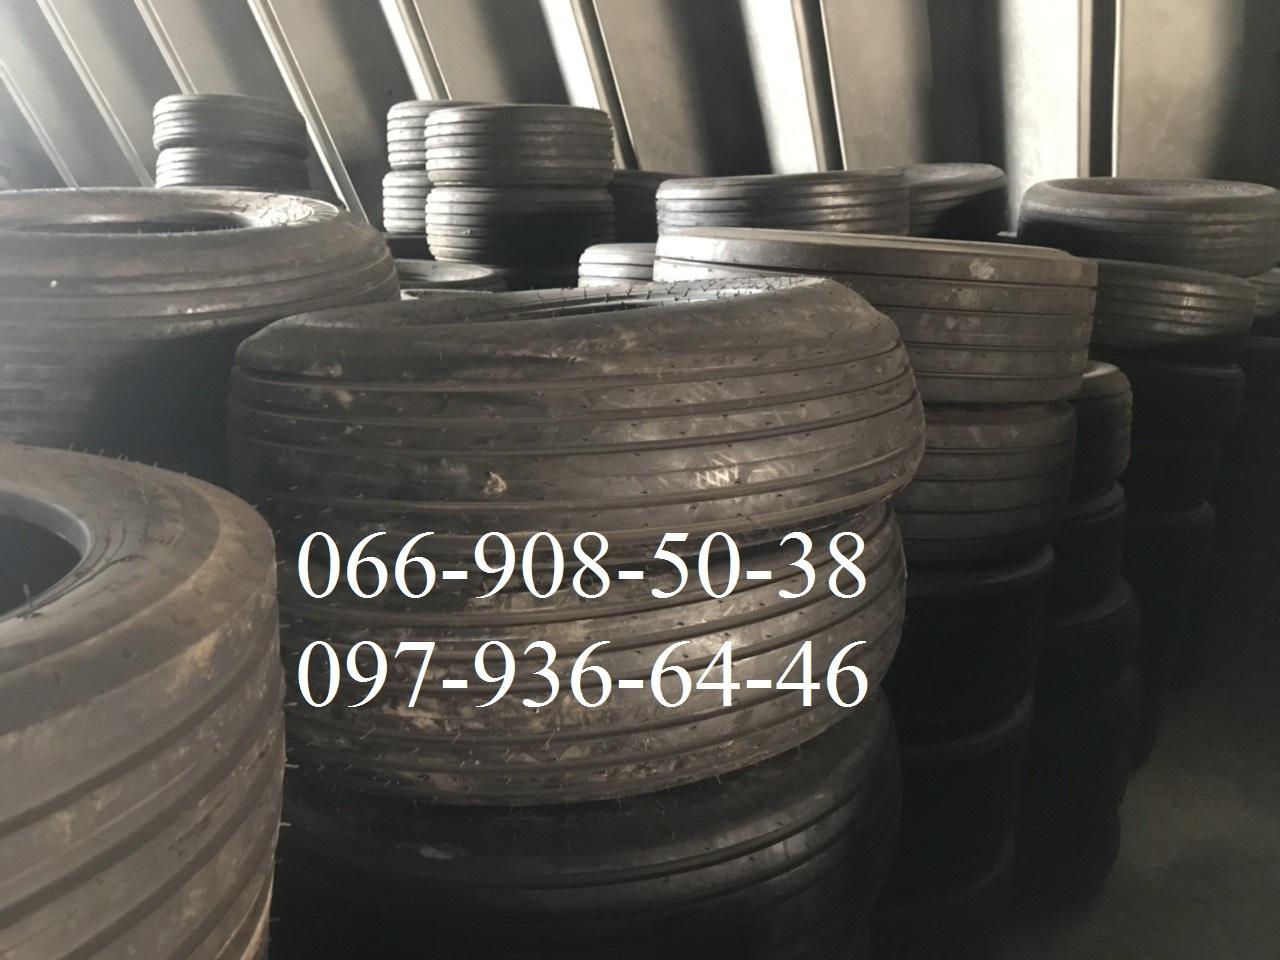 7.60L-15SL, 11L-15 SL, 9.5L-15 SL, 12L-15SL 11L-16FI, 11L-14FI Шины